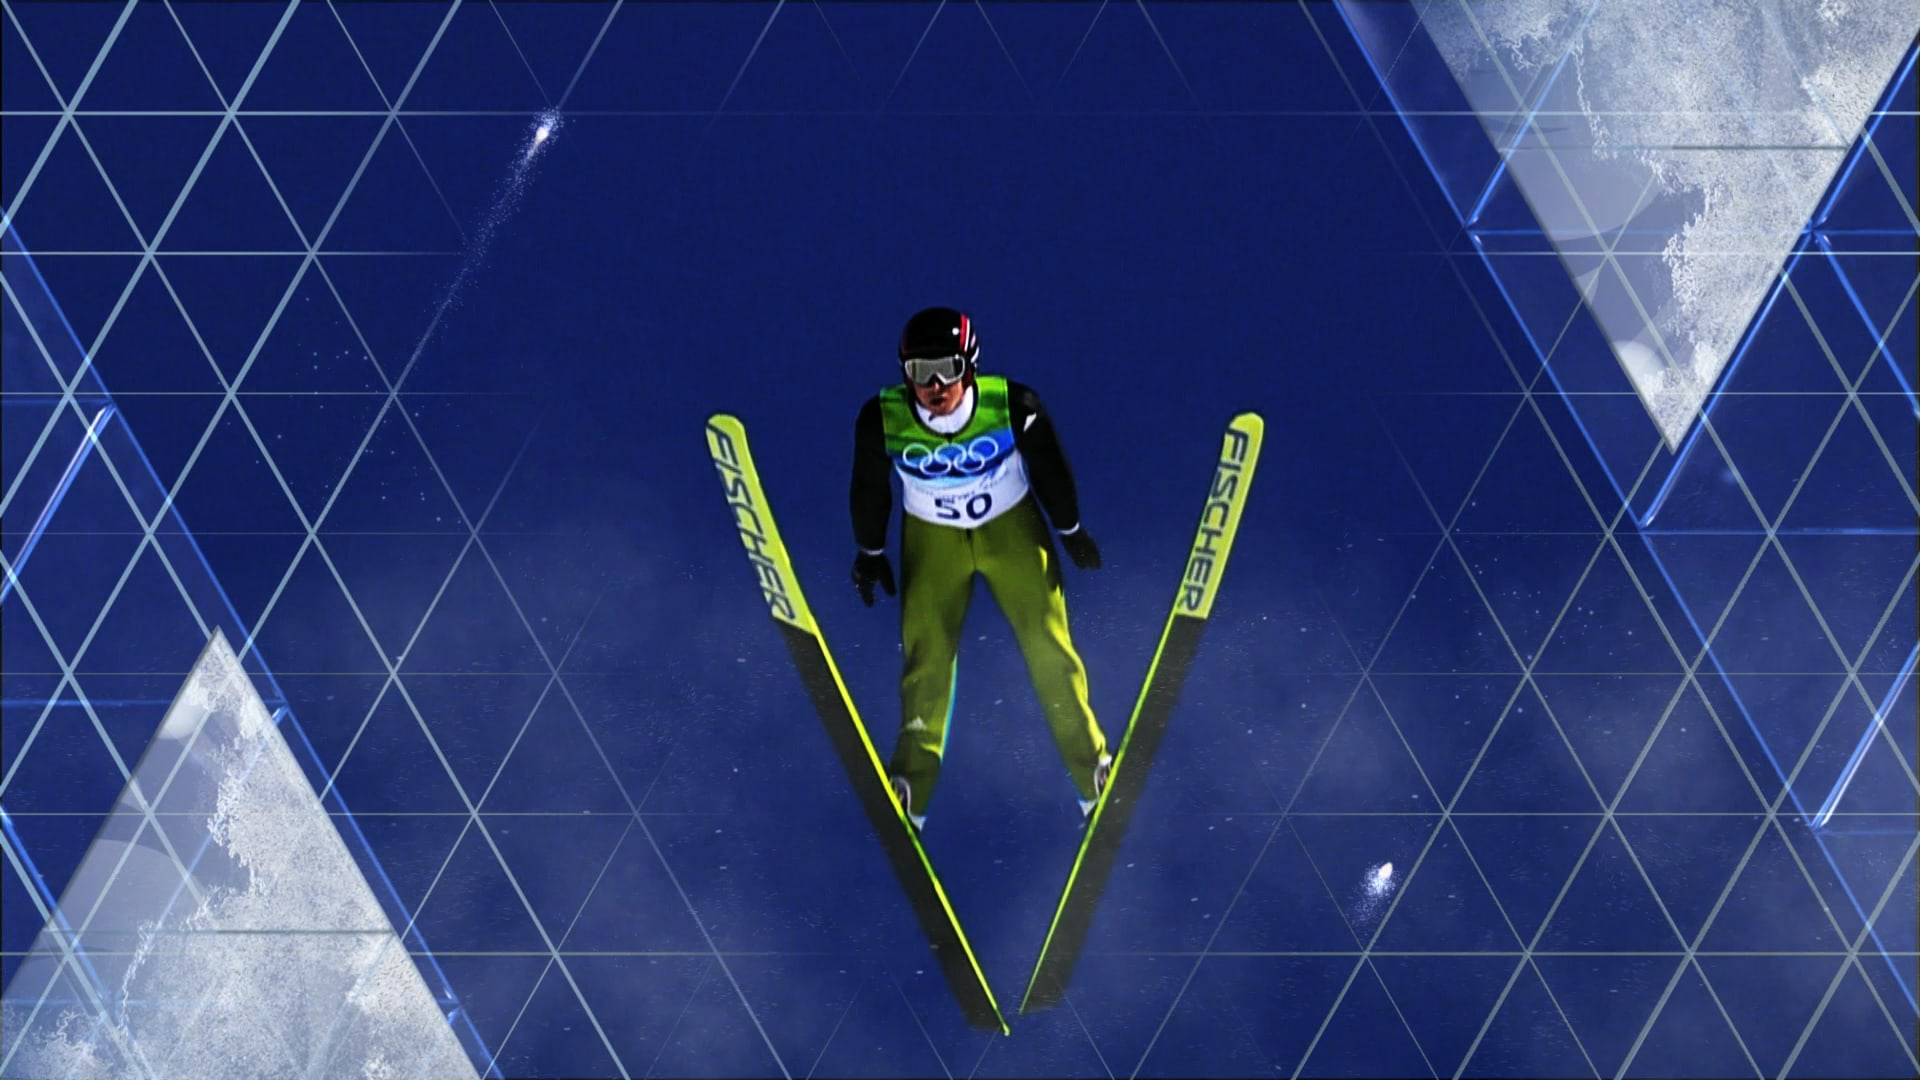 Bumpers Sochi Olympics 2016